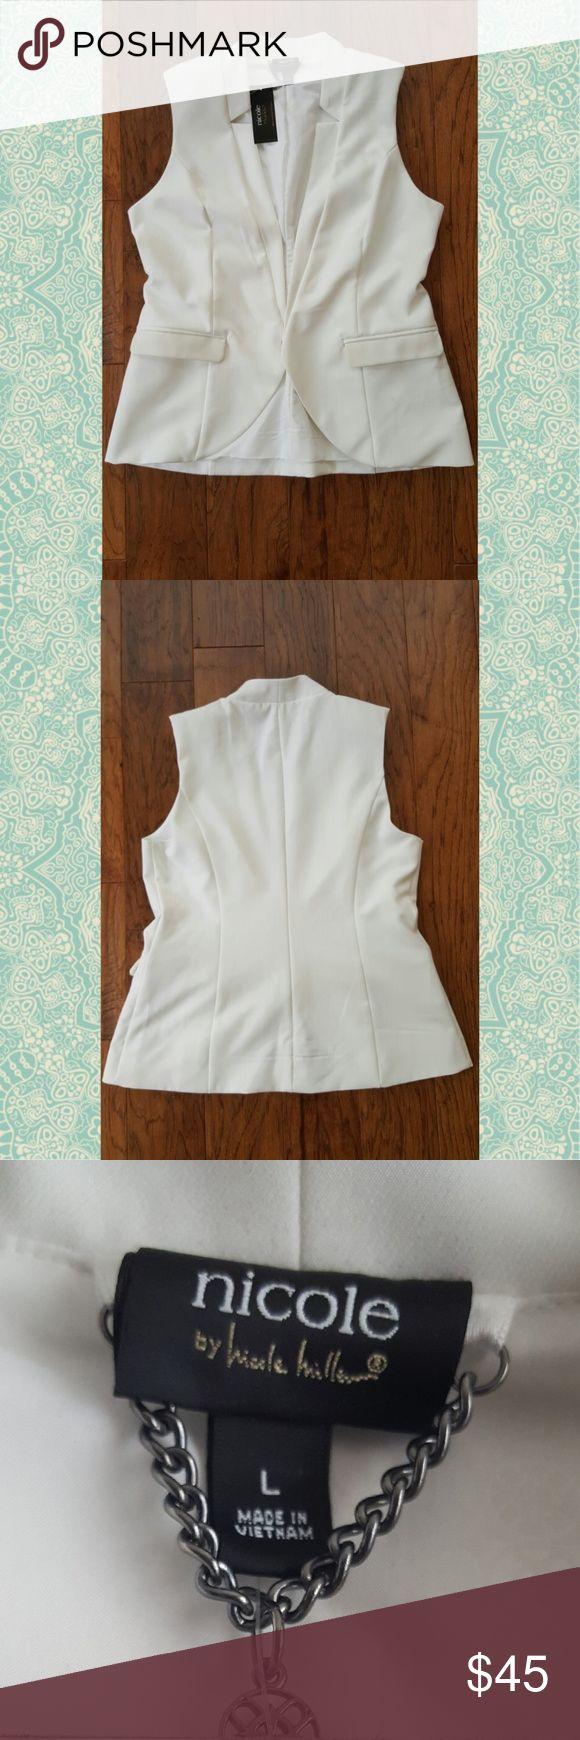 Nicole Miller Vest Off white vest with faux leather pockets, lining inside of vest Nicole Miller Other